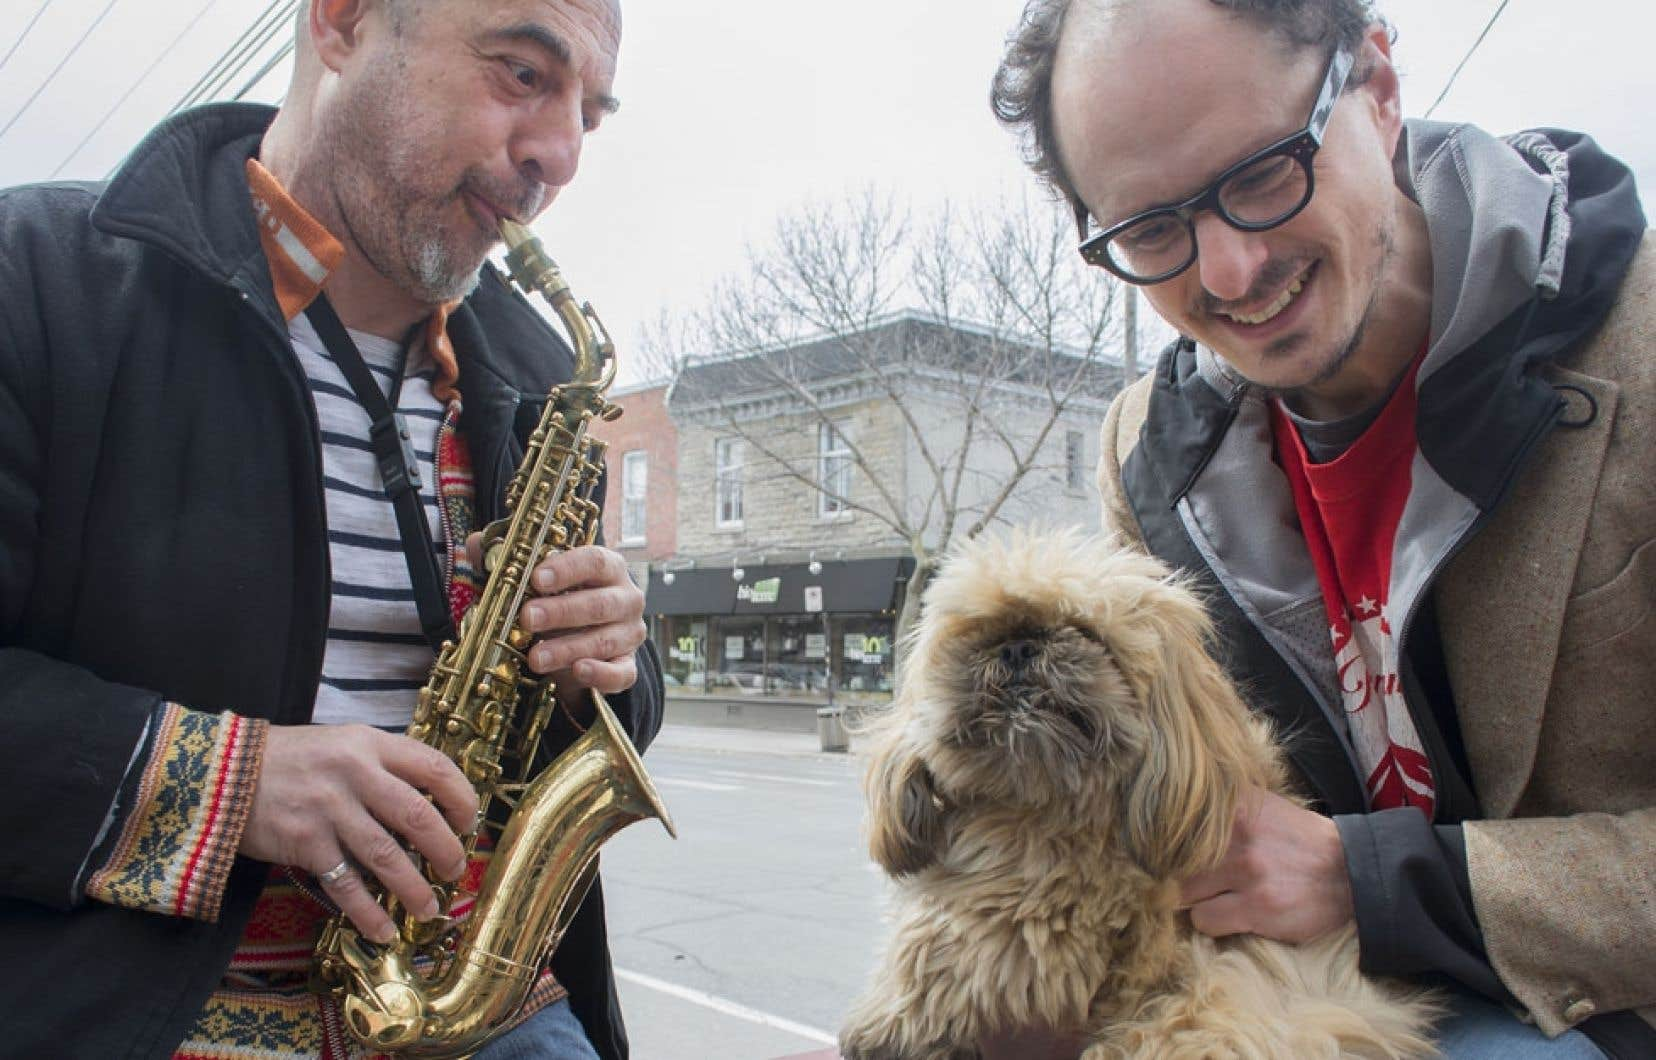 Damian Nisenson, saxophoniste et organisateur du festival Malasartes, divertit Socalled et son chien Poopsy.